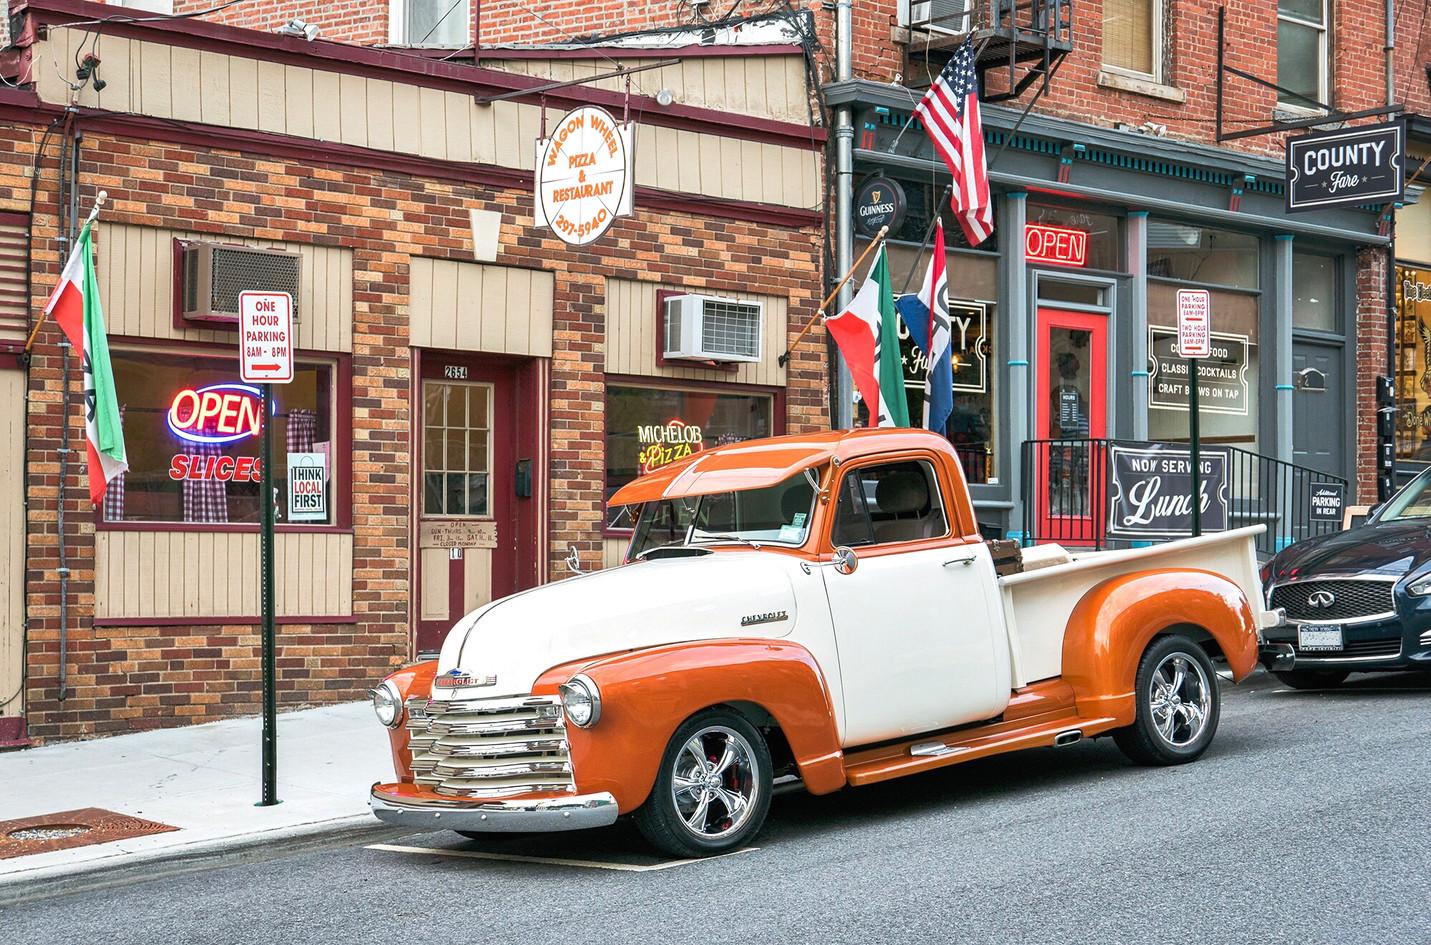 chevy-truck_37765818301_o.jpg